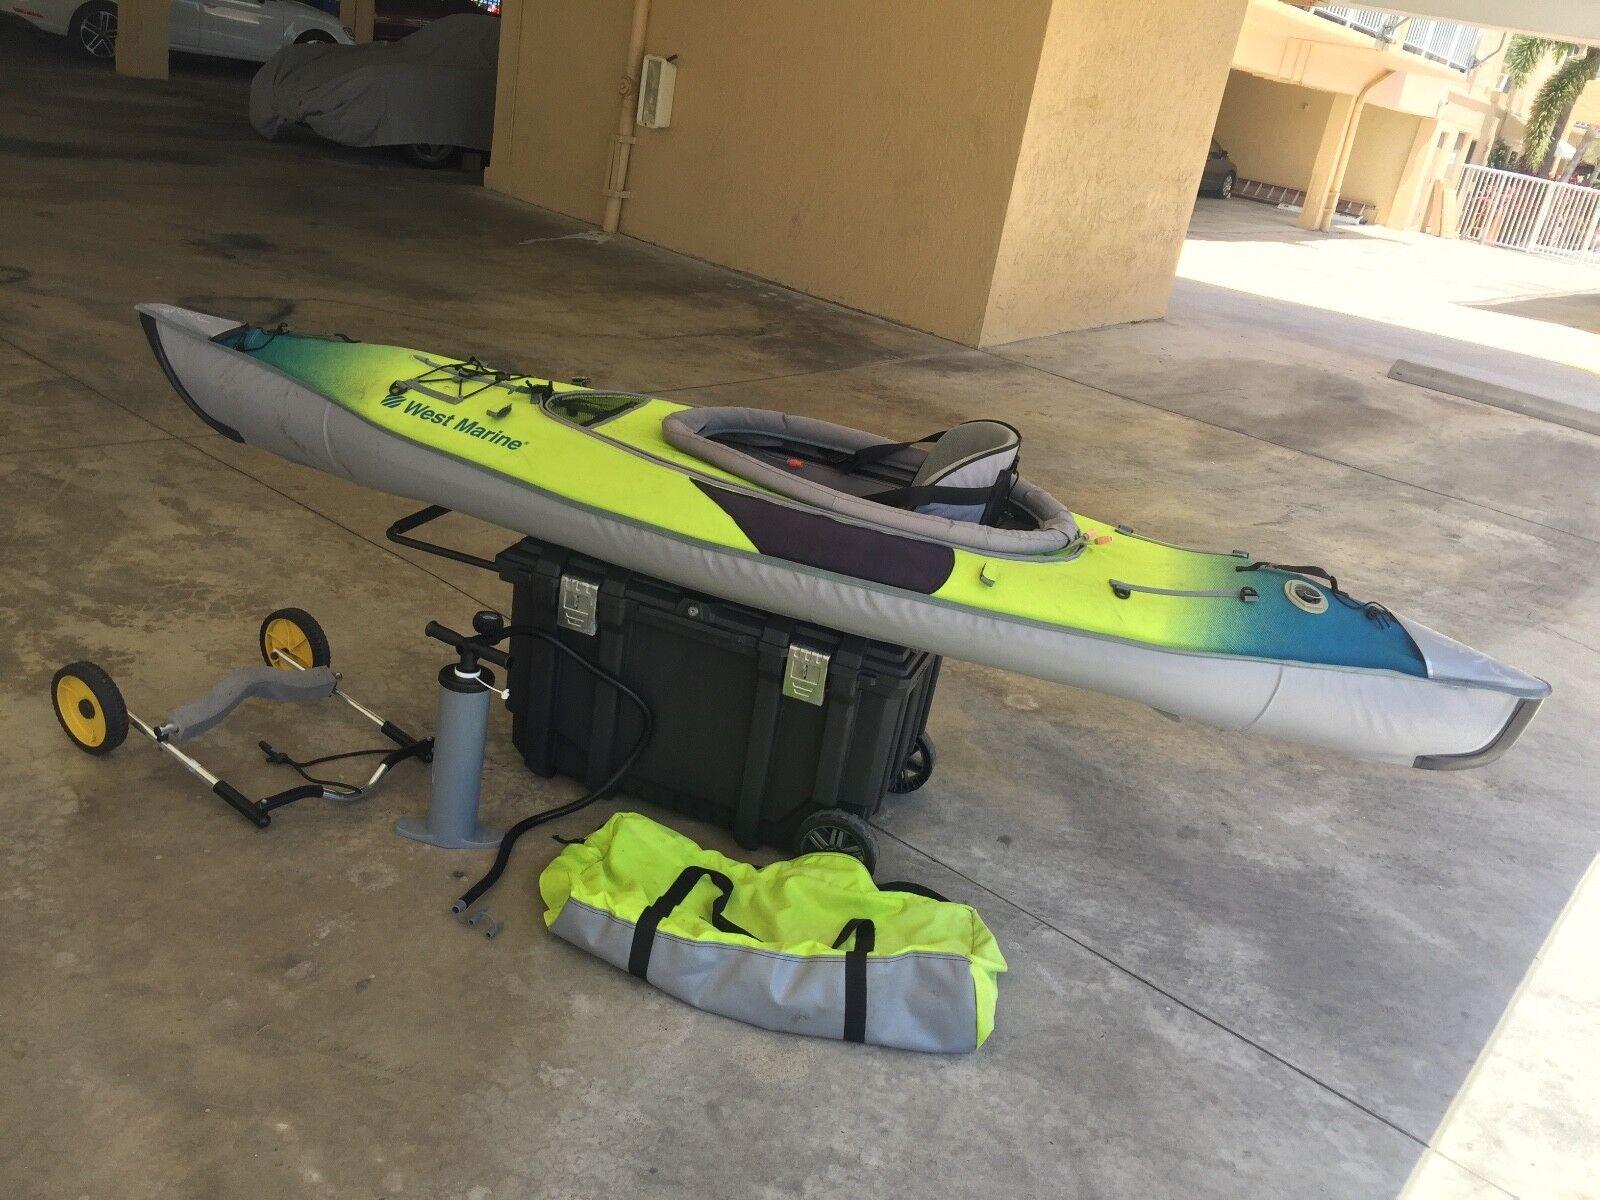 West marine inflatable Advanced Frame kayak